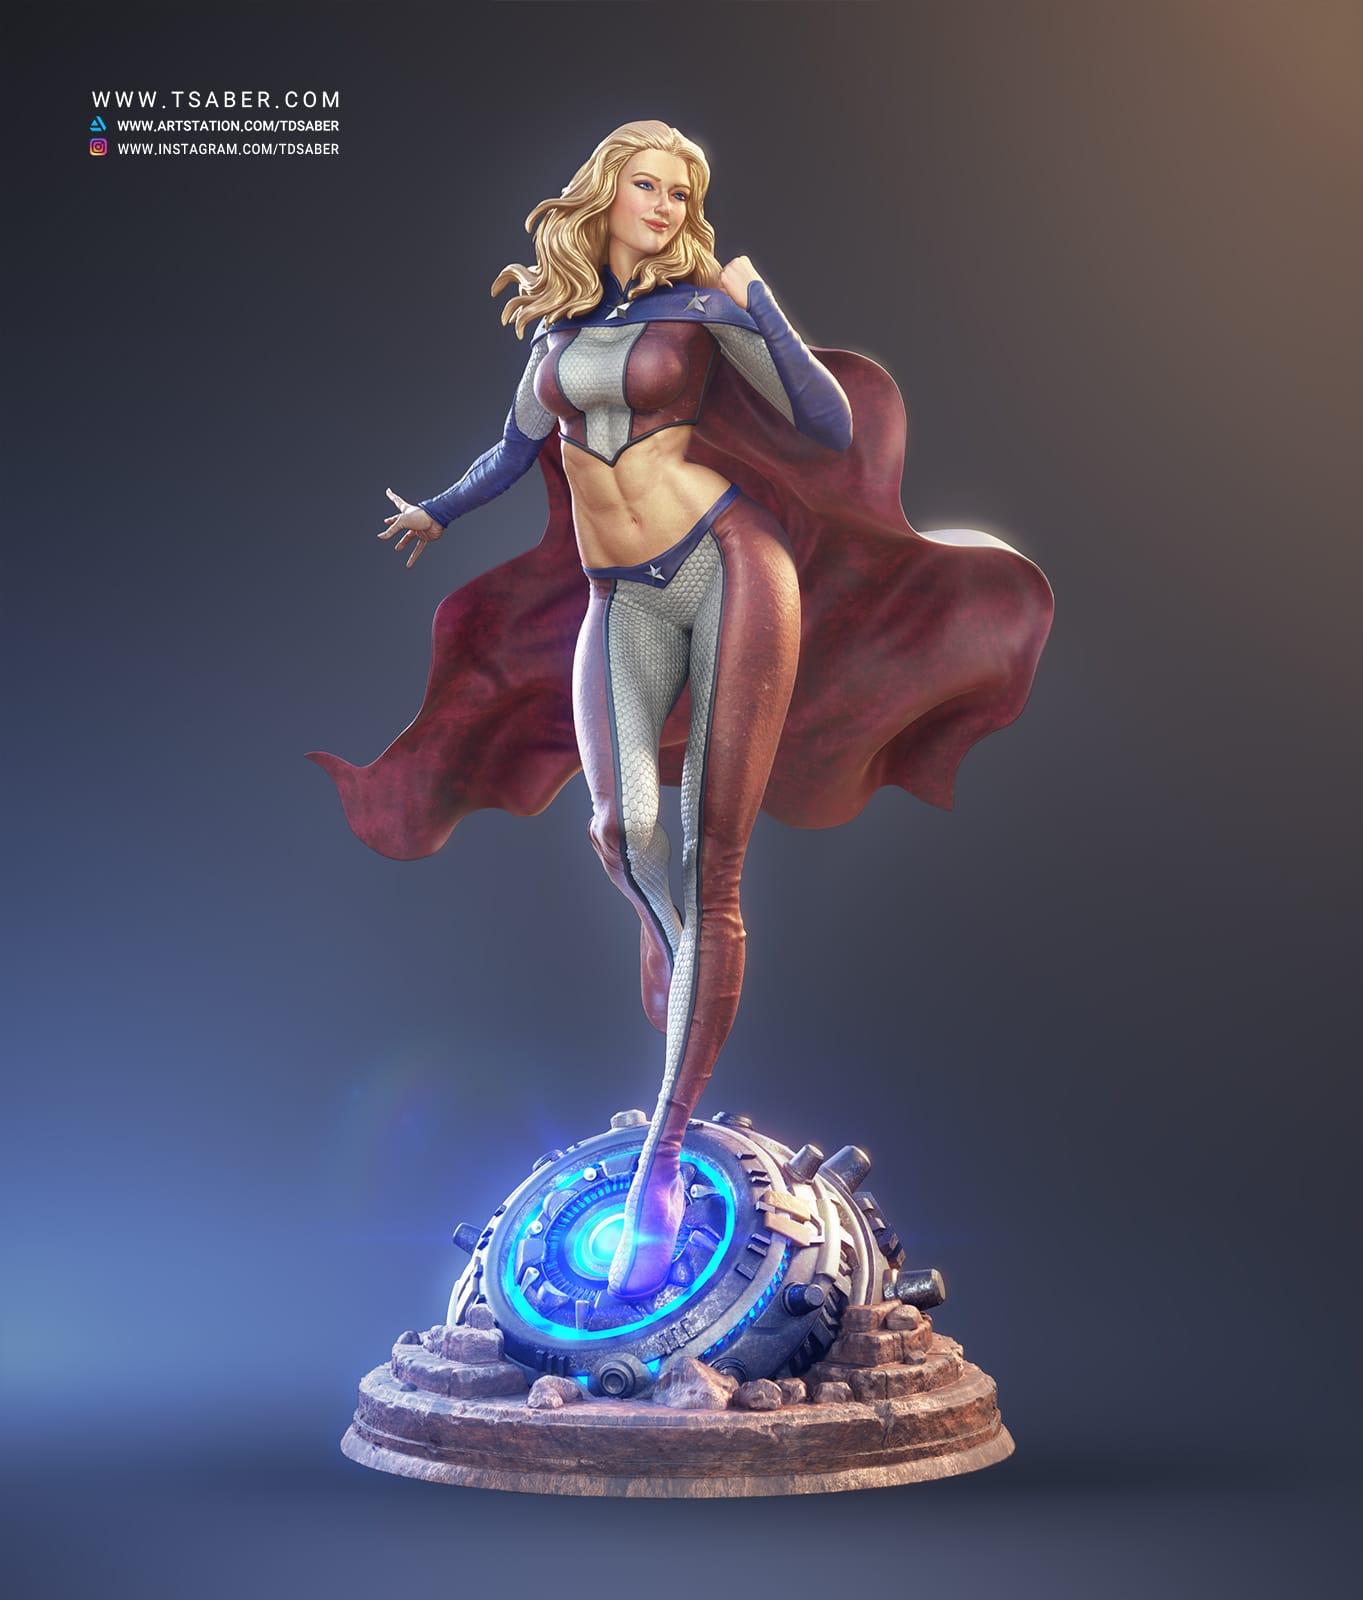 American Star Statue - Superhero character- Tsaber